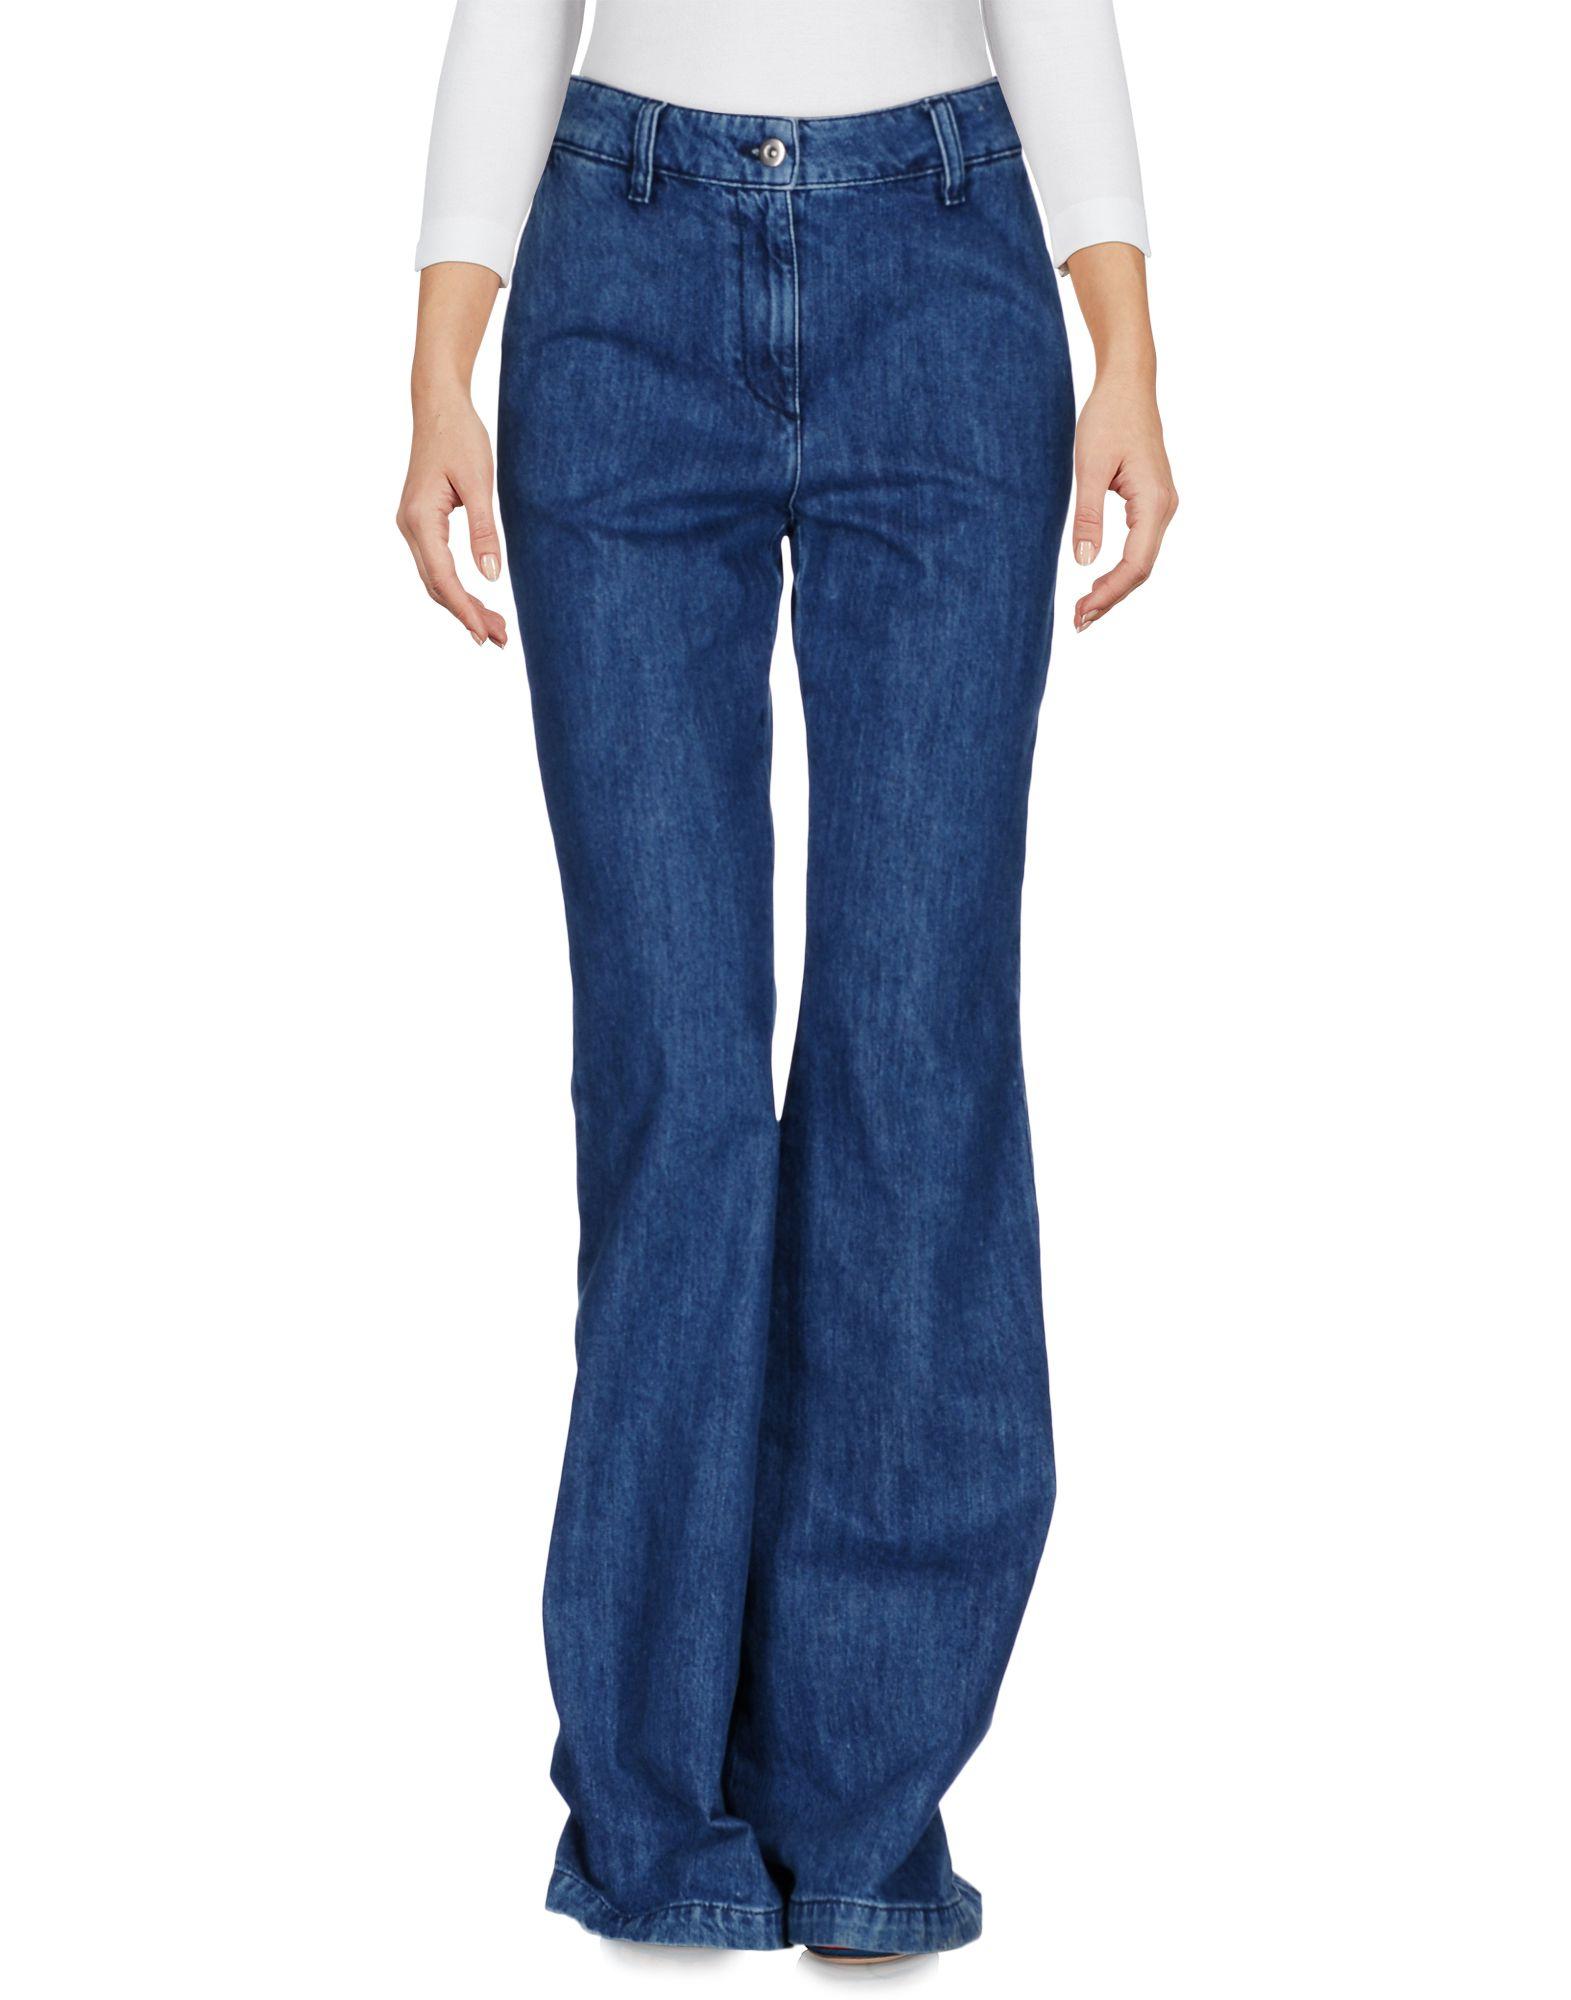 брюки au jour le jour брюки укороченные AU JOUR LE JOUR Джинсовые брюки